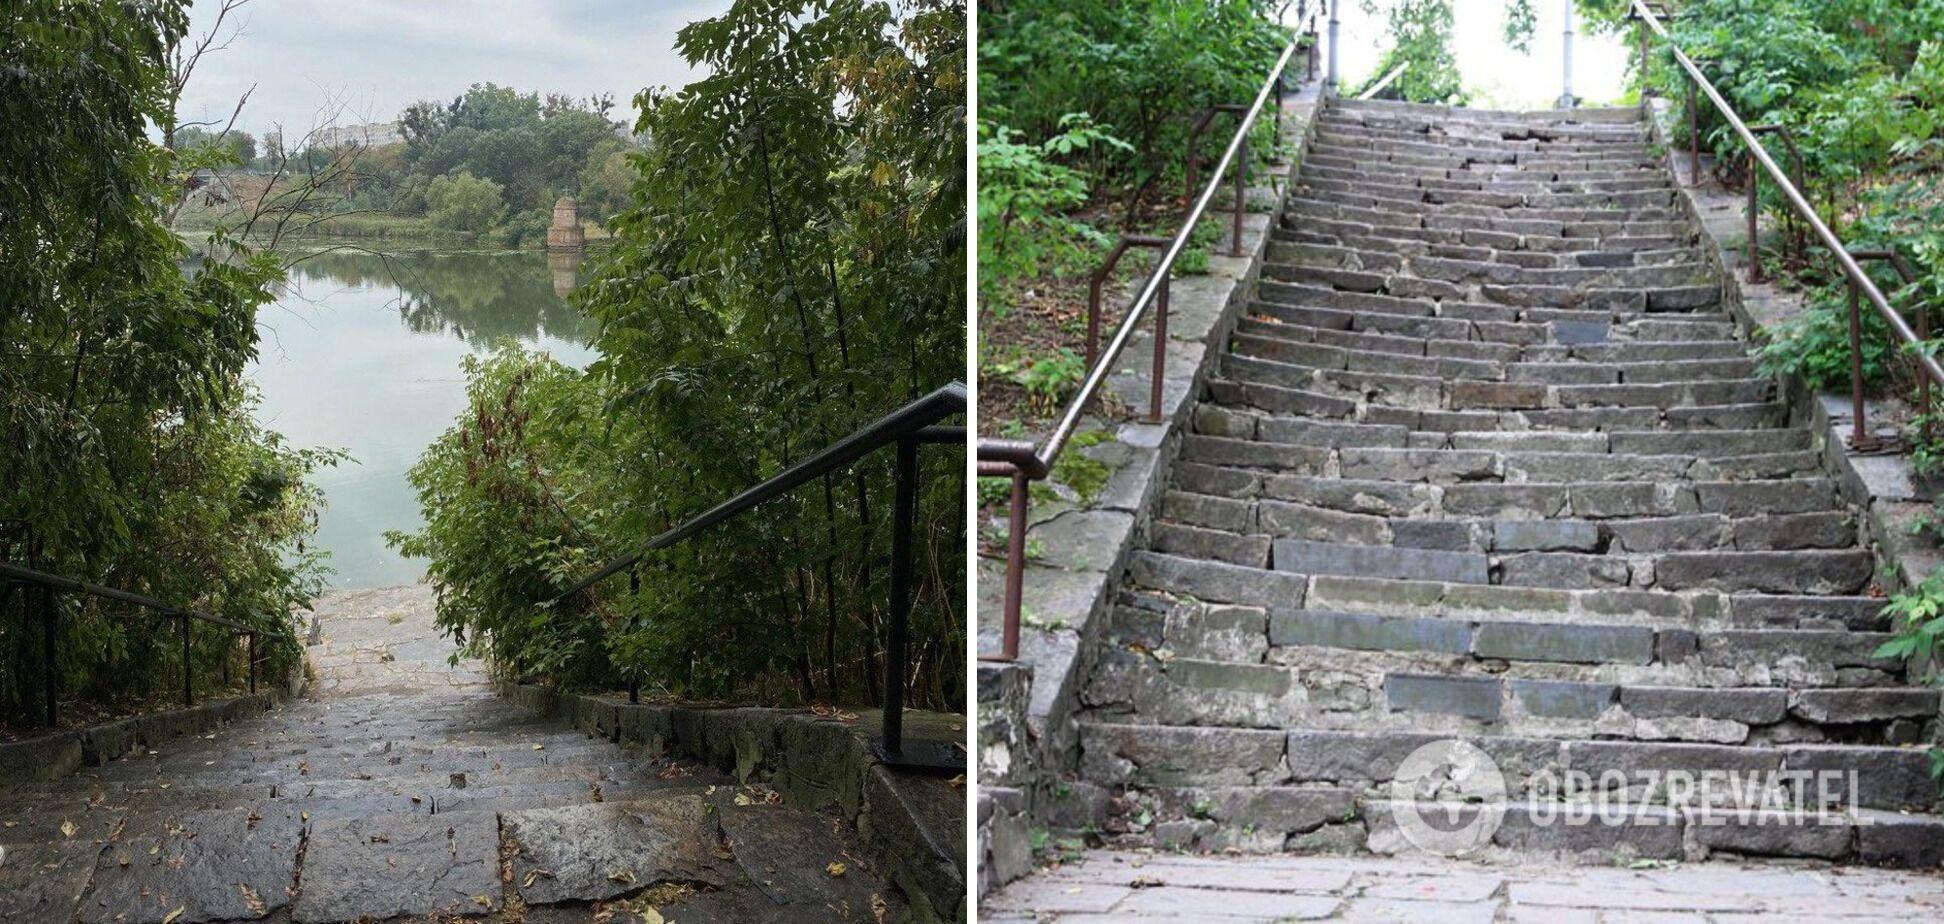 Лестница ведет прямо к реке.